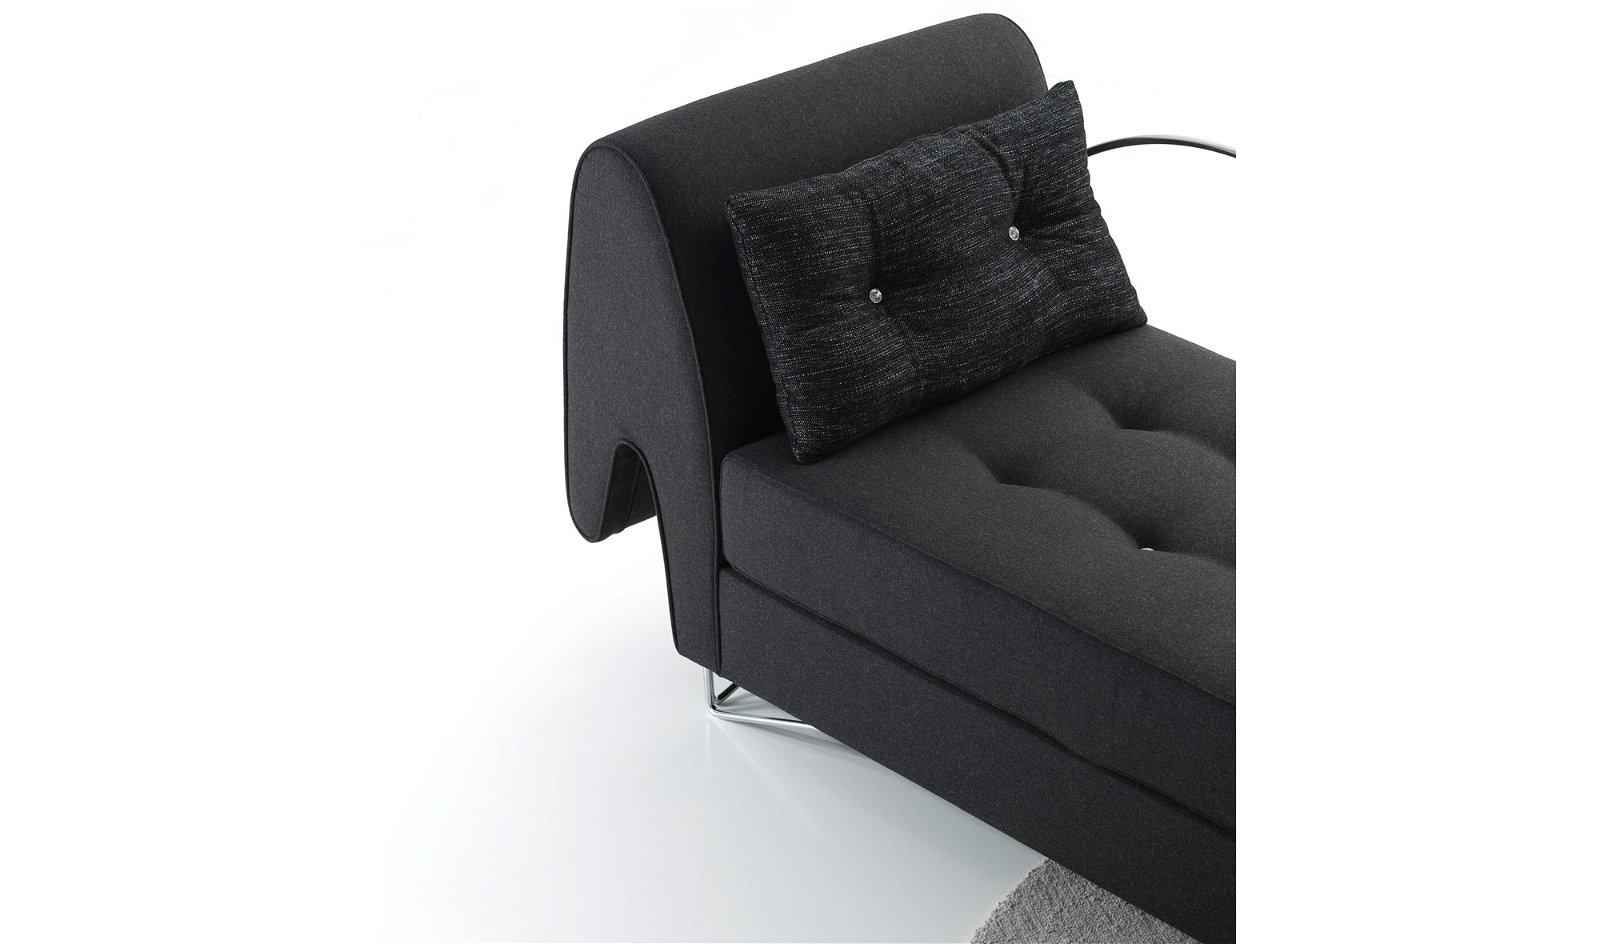 Chaise longue moderno Saurio